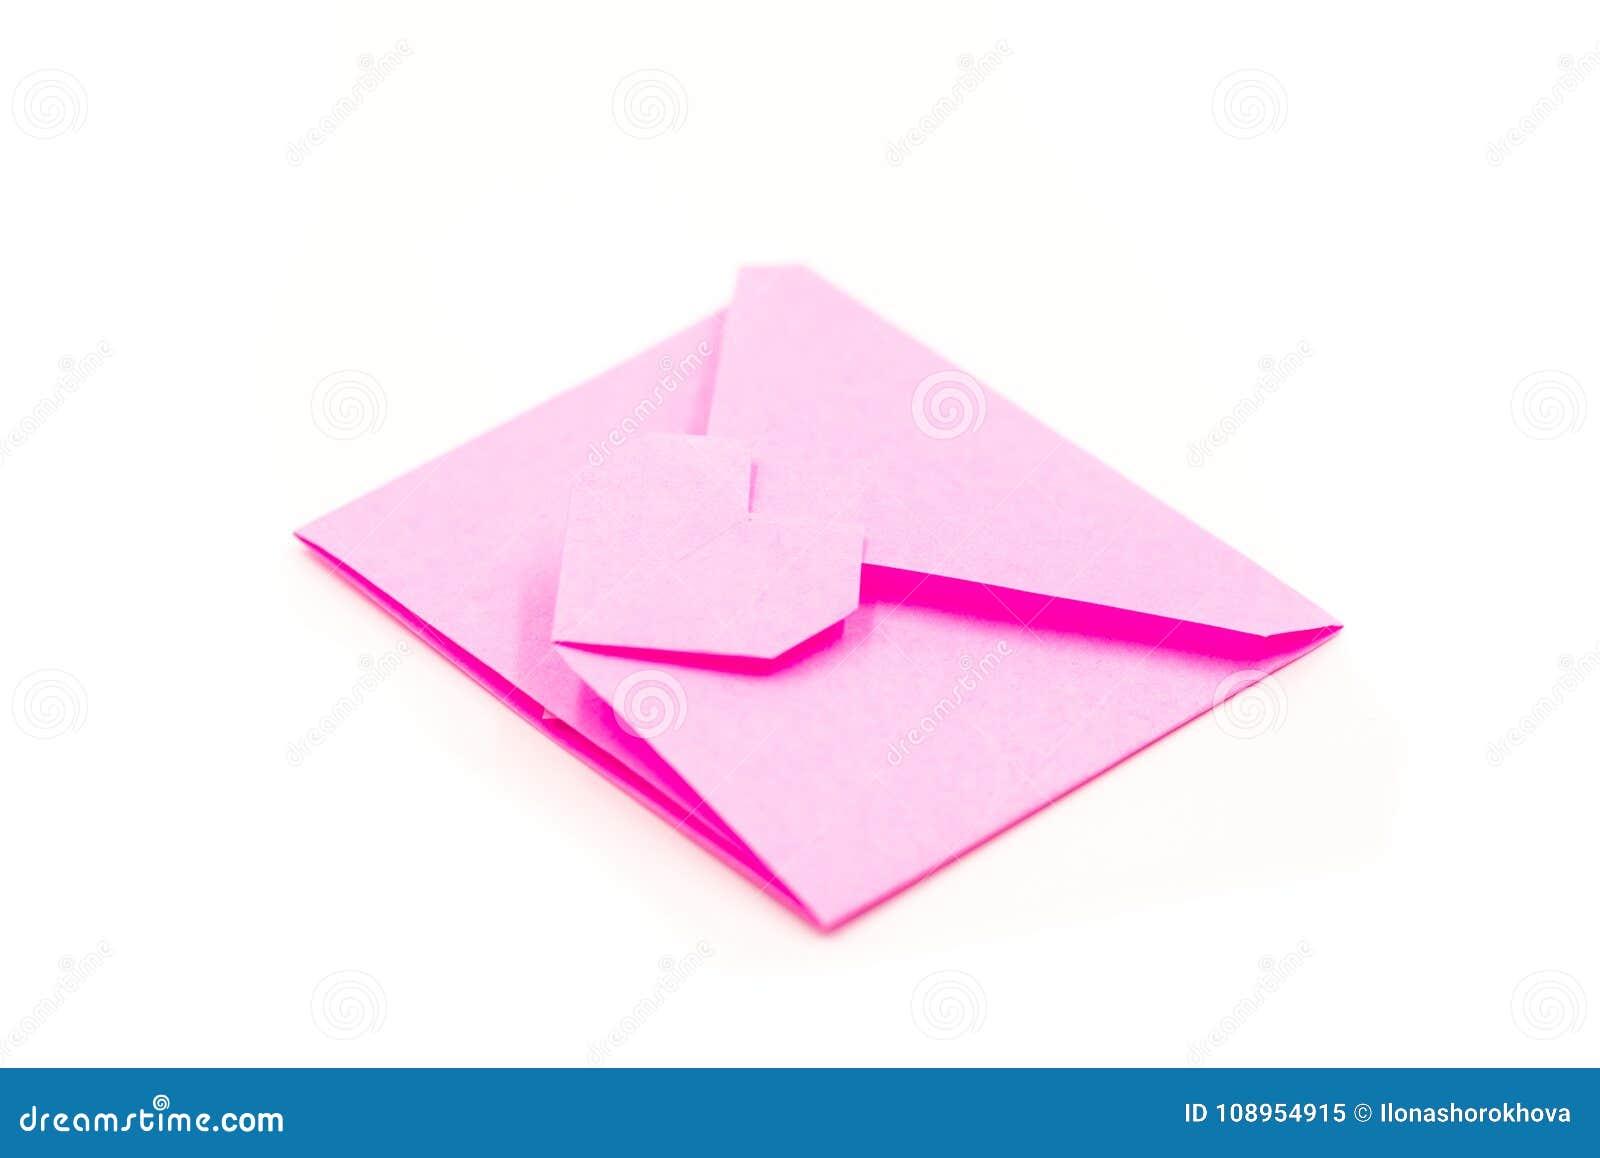 Easy Origami Envelope Making Tutorial - DIY Paper Envelope… | Flickr | 957x1300